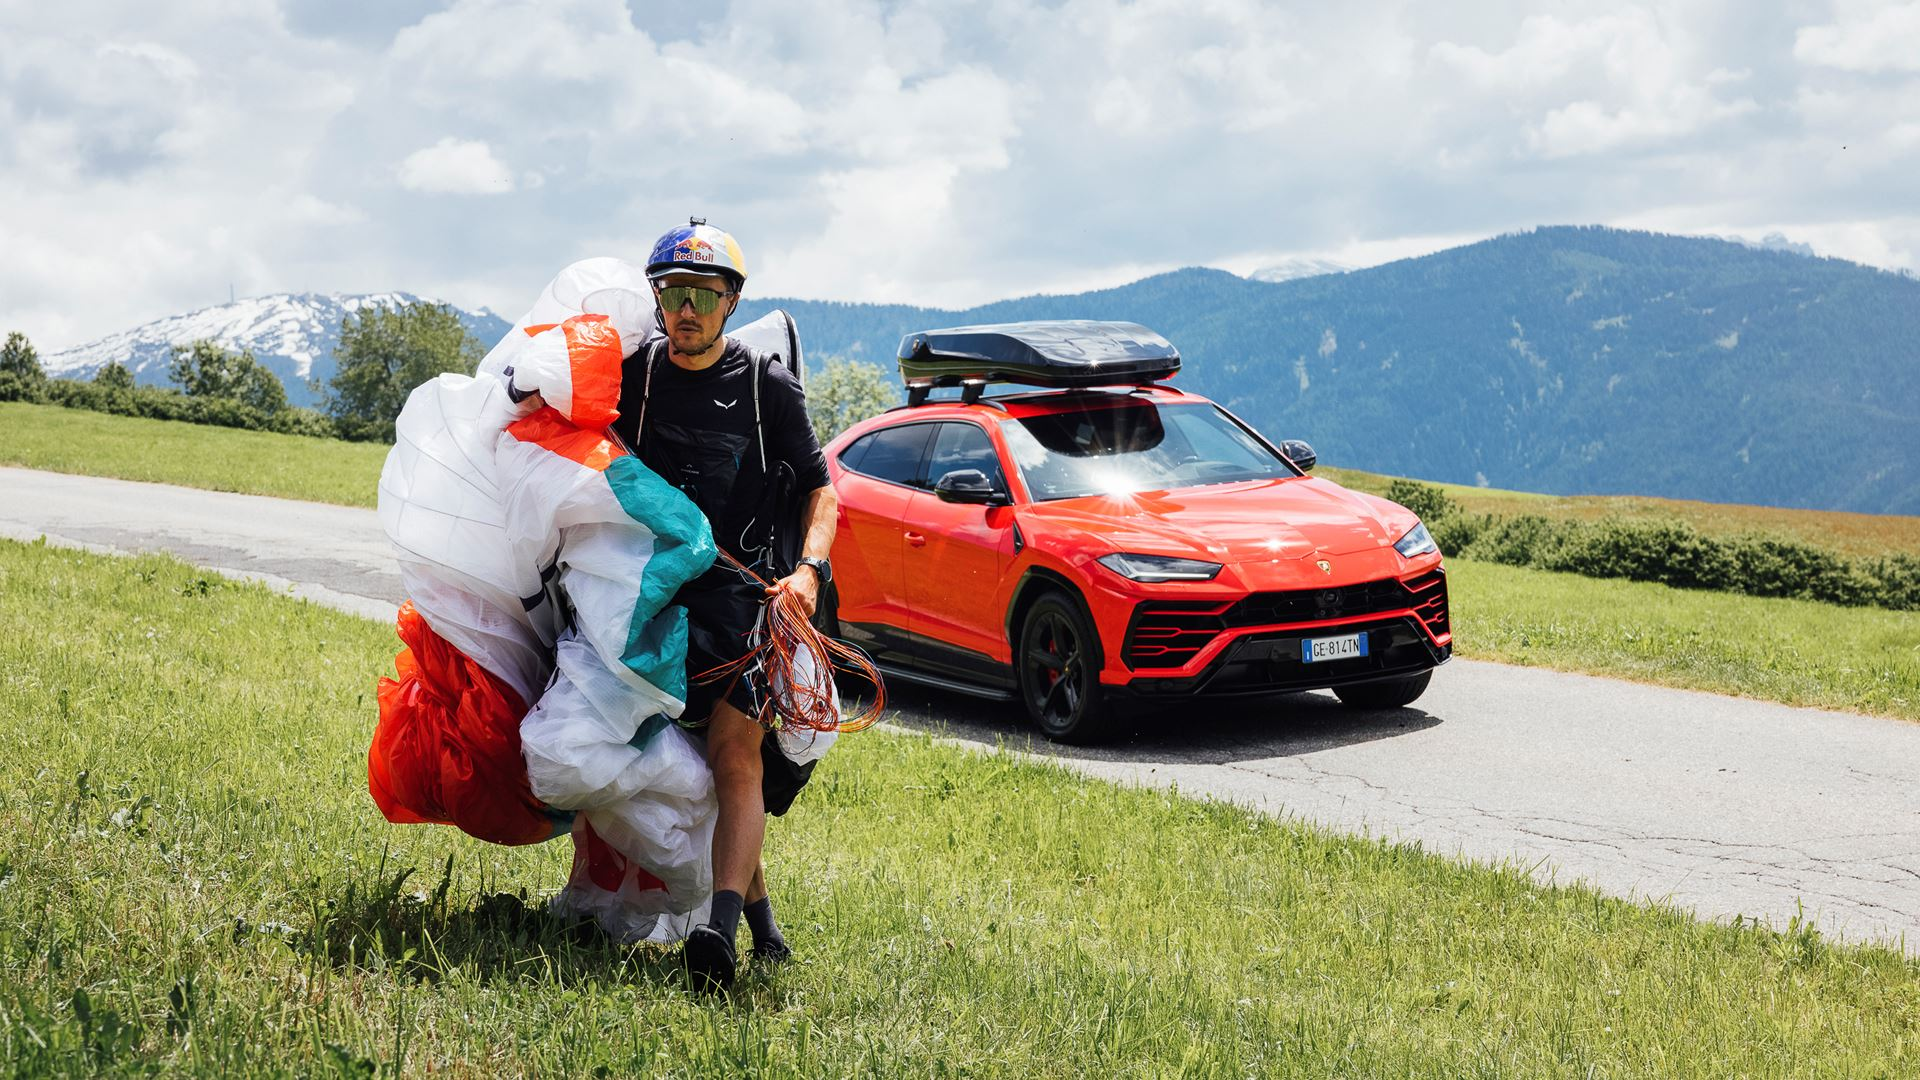 Lamborghini Urus and Aaron Durogati together for an extraordinary feat - Image 3